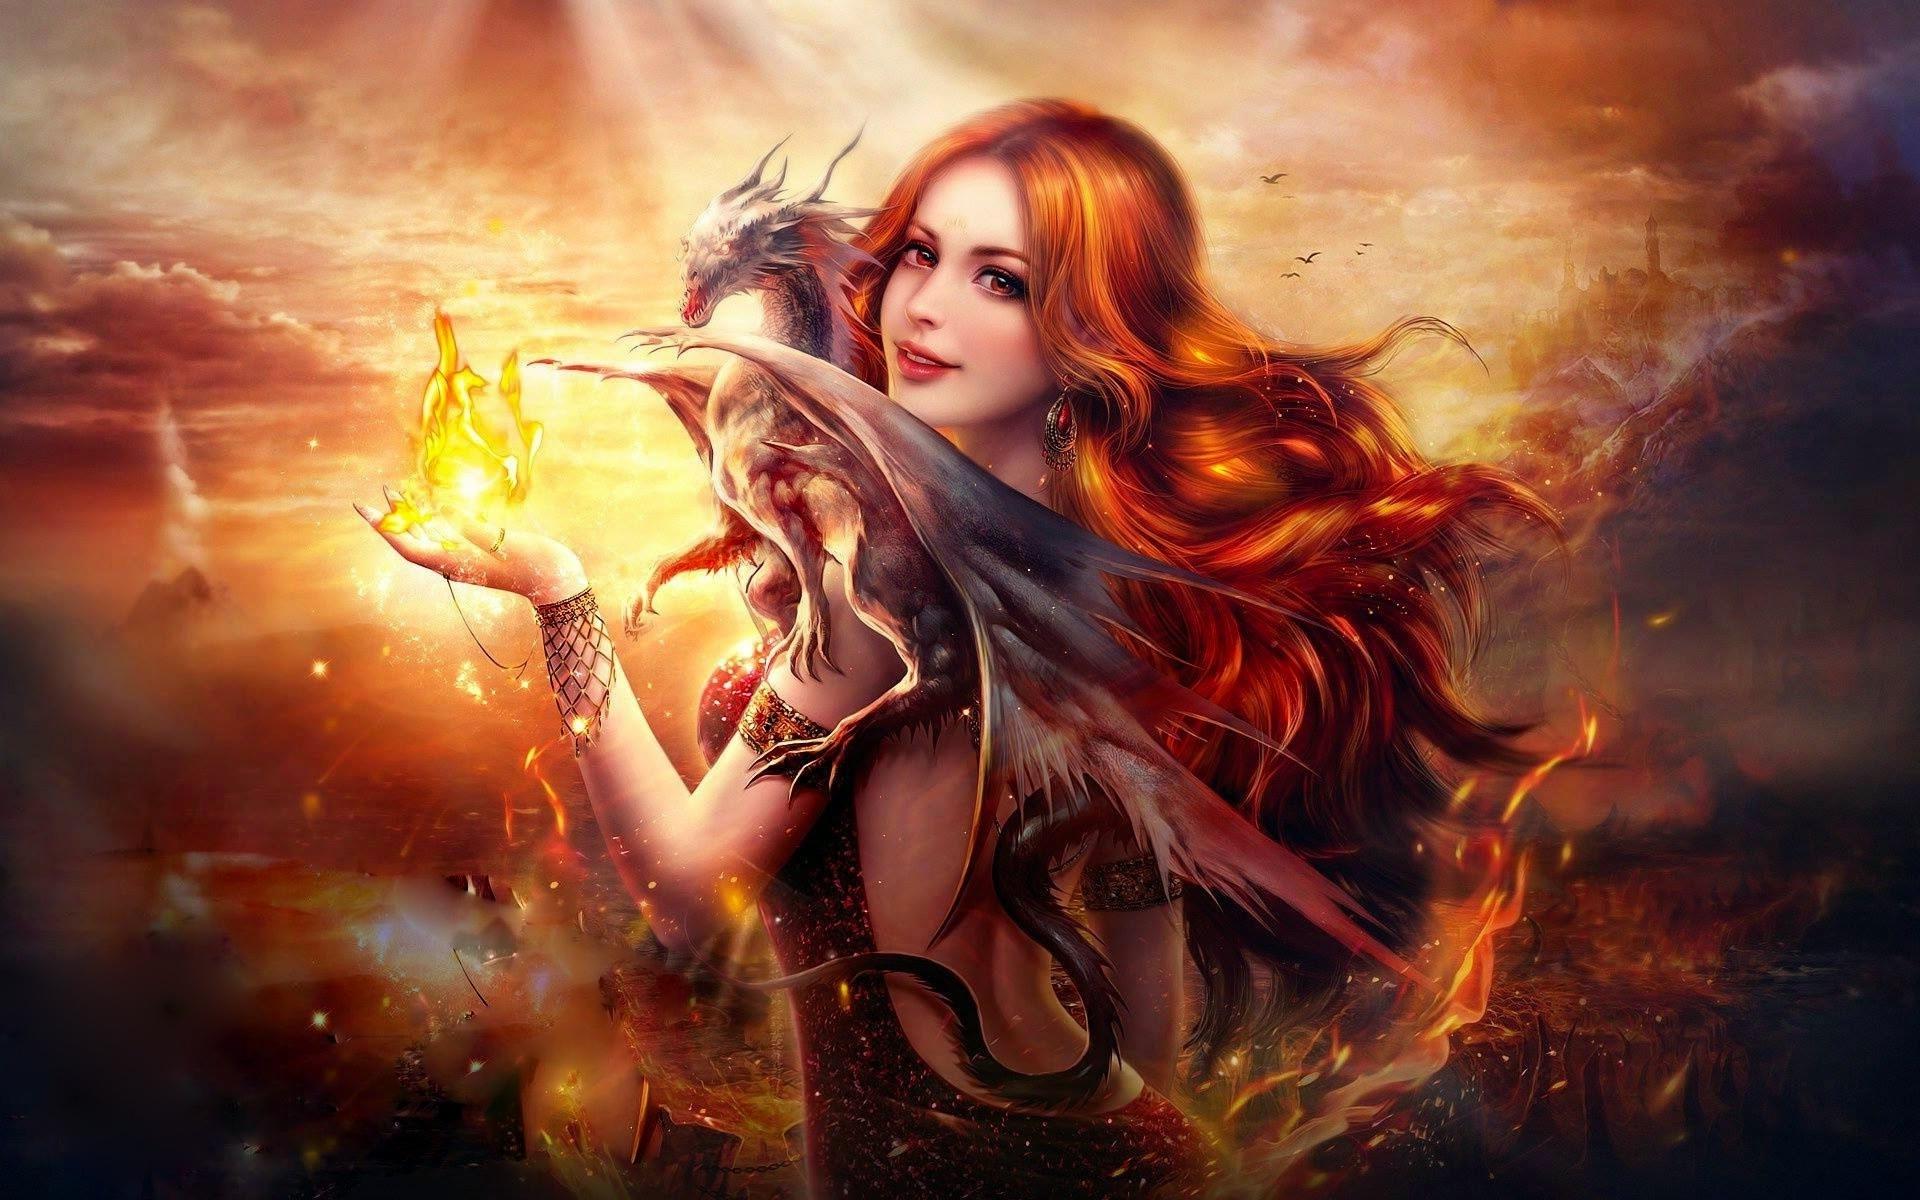 Kelly Fire Wallpaper Free: Dragon Fire Fantasy Girl Wallpapers In Jpg Format For Free